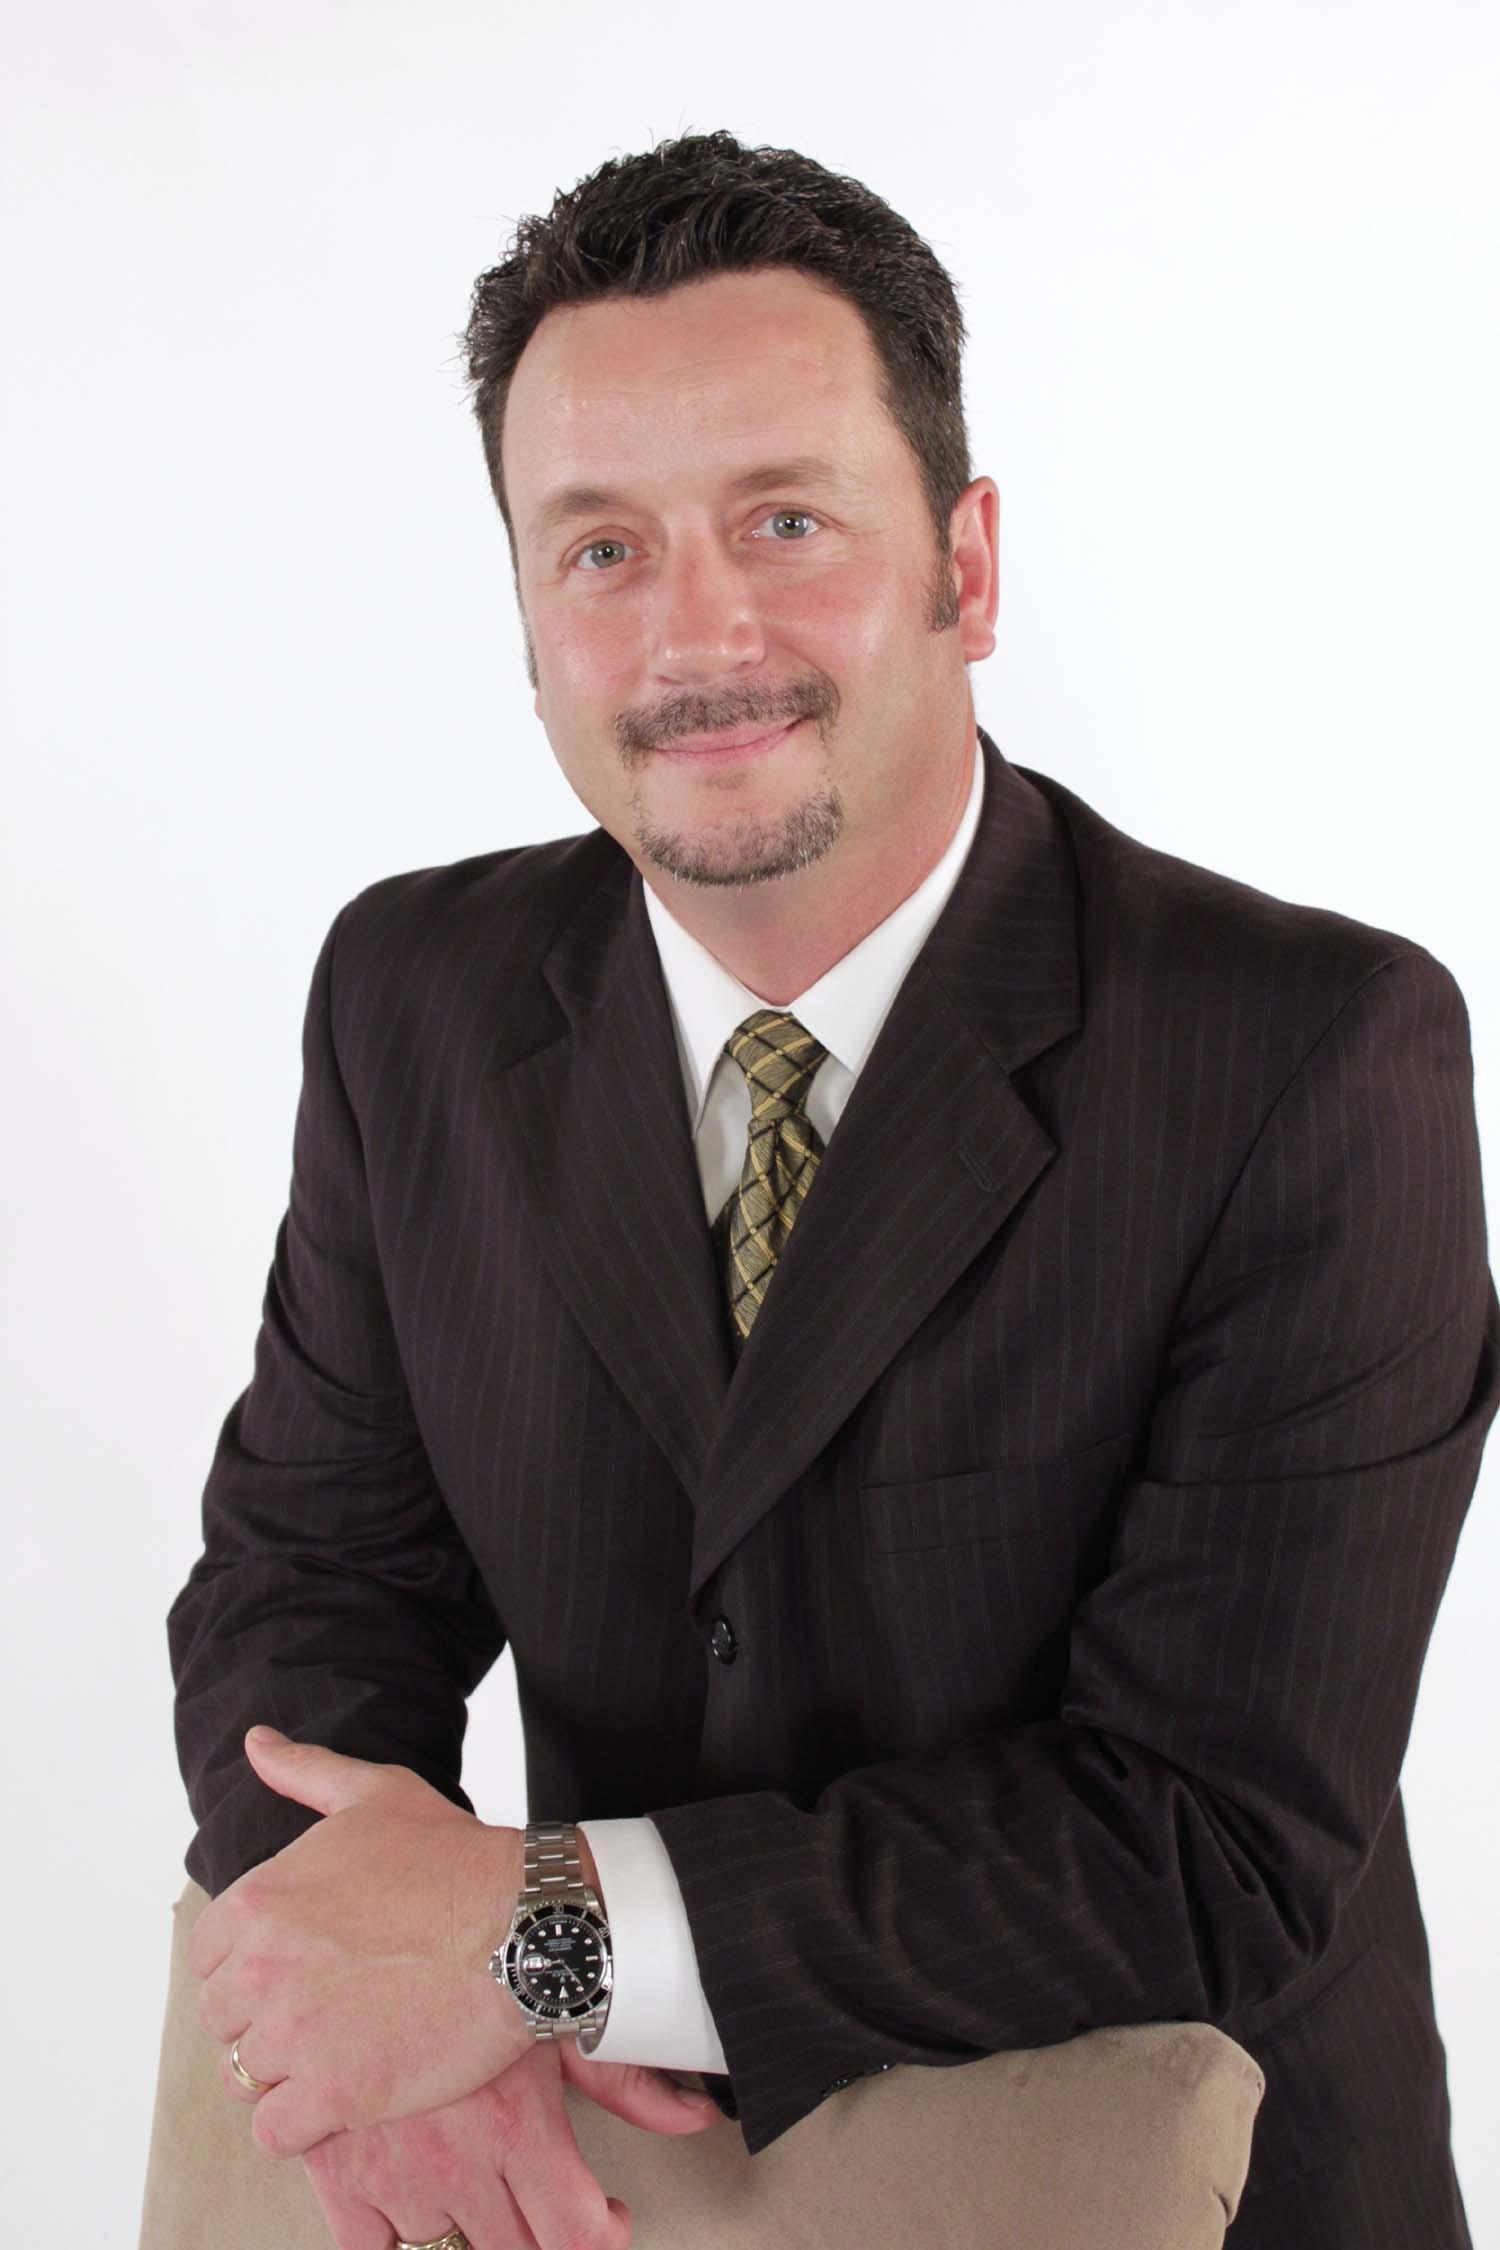 John Grubbs